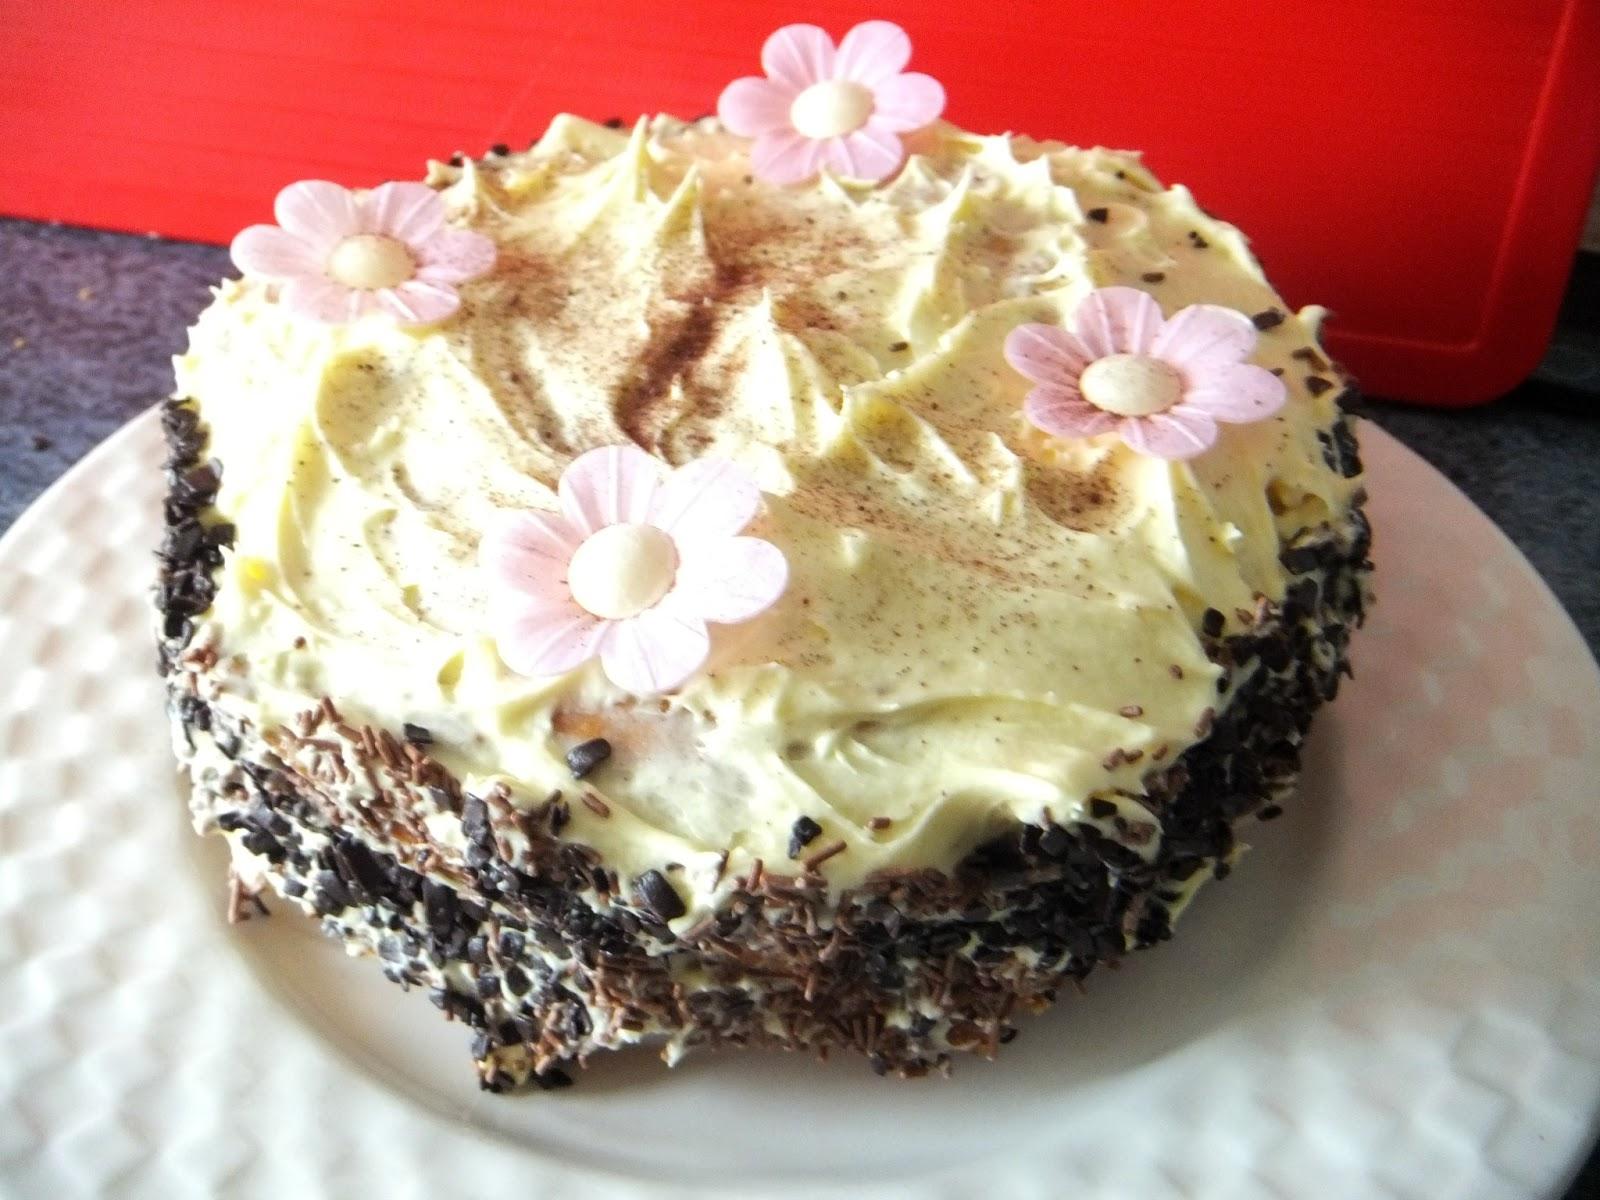 Diabetic Sponge Cake Recipes Uk: Fun As A Gran: Recipes That Have Helped Get The Diabetes